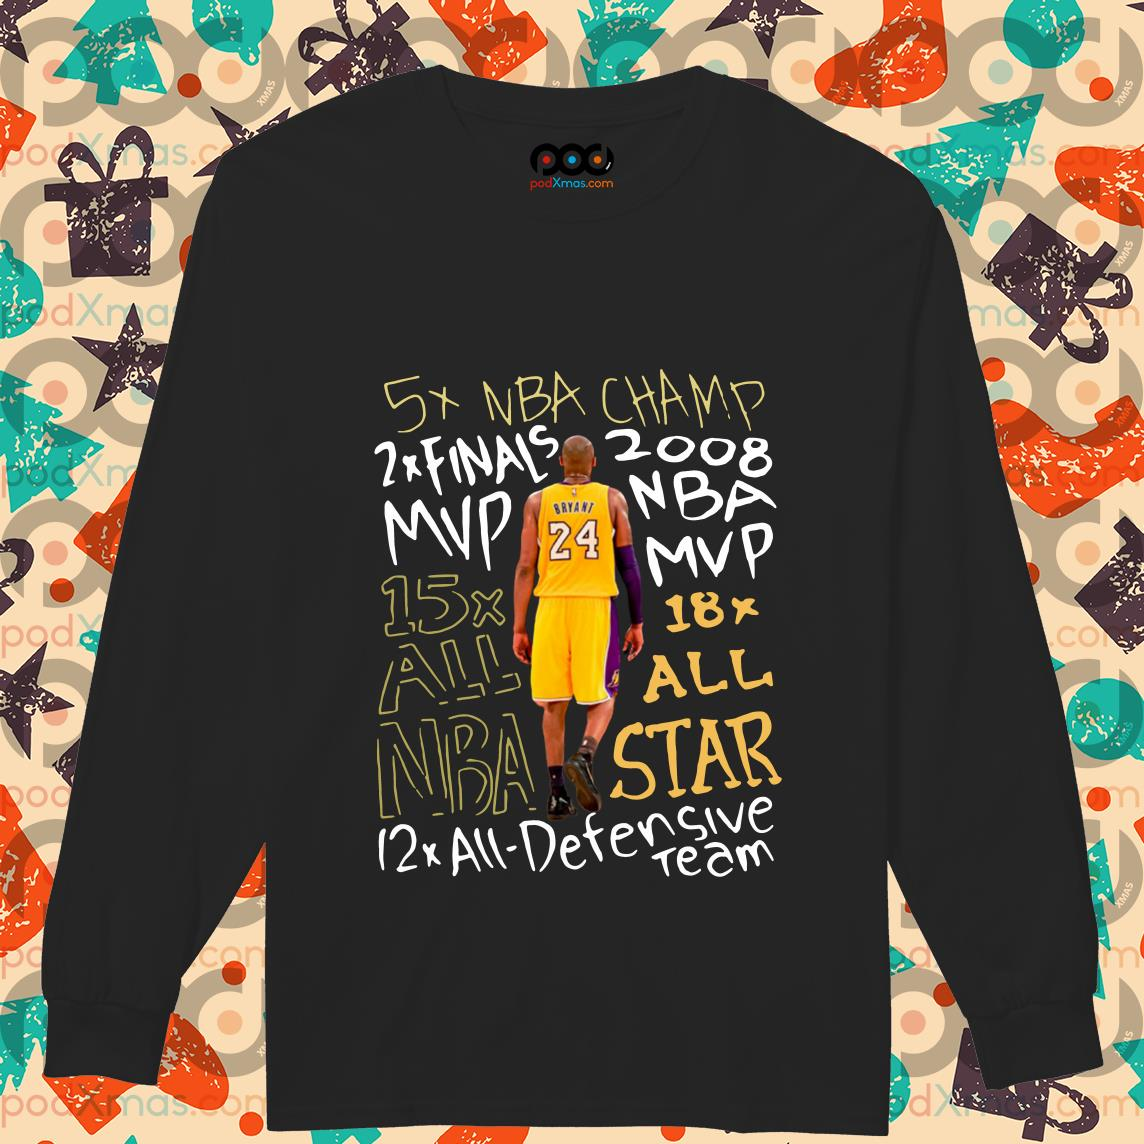 Kobe Bryant 24 5X NBA Champ 2x Finals 2007 MVP NBA long sleeve